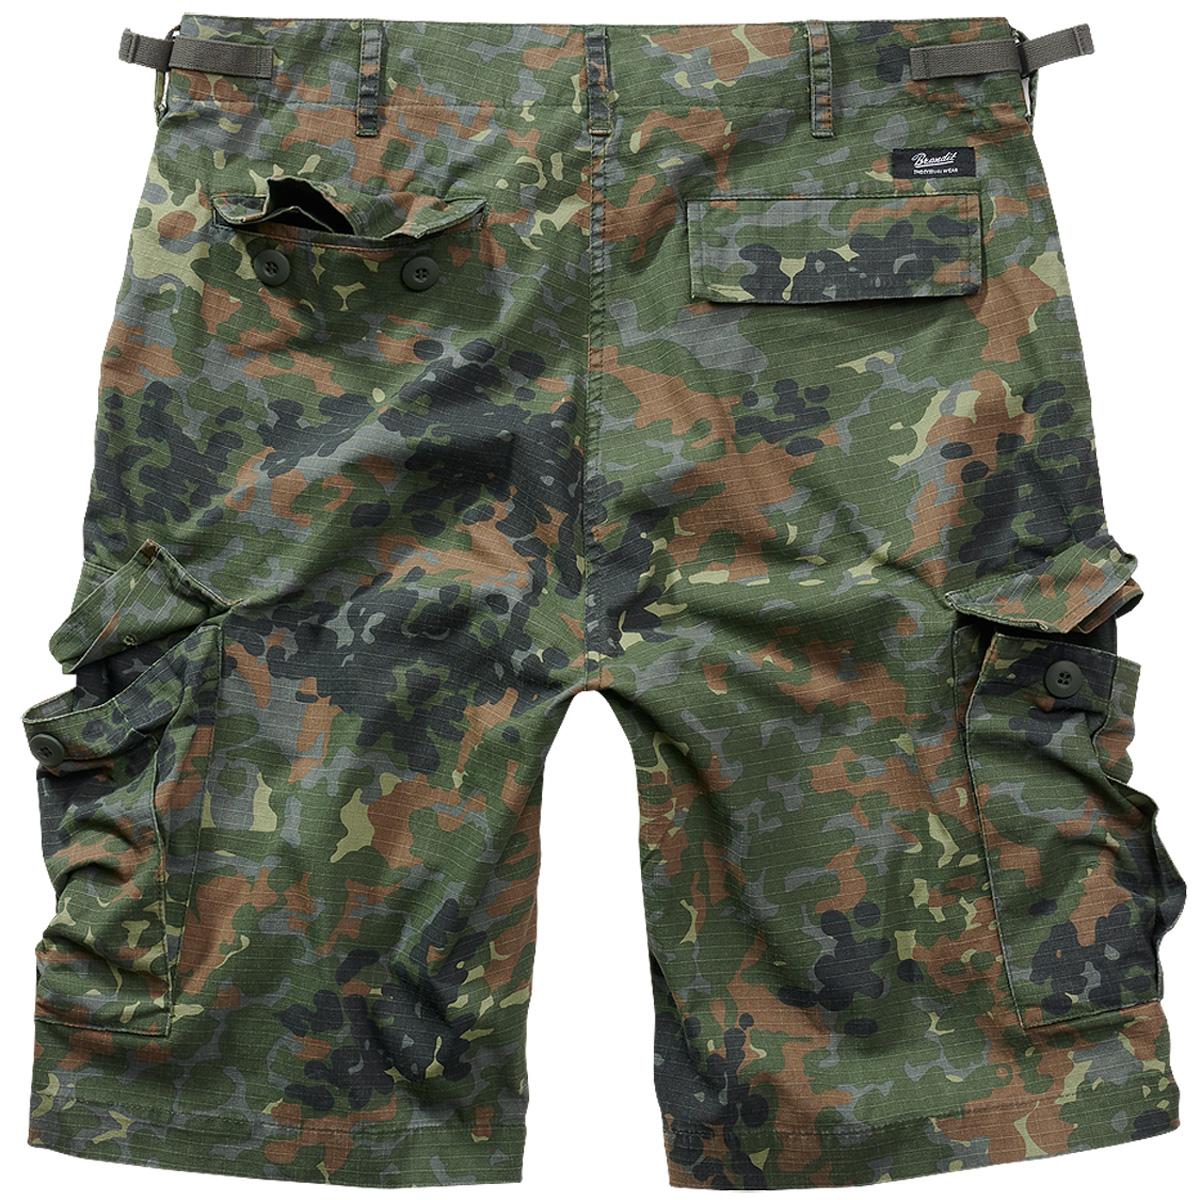 Brandit-BDU-Ripstop-Shorts-S-7XL-Army-Cargo-Bermuda-Outdoor-Short-kurze-Hose miniatura 11